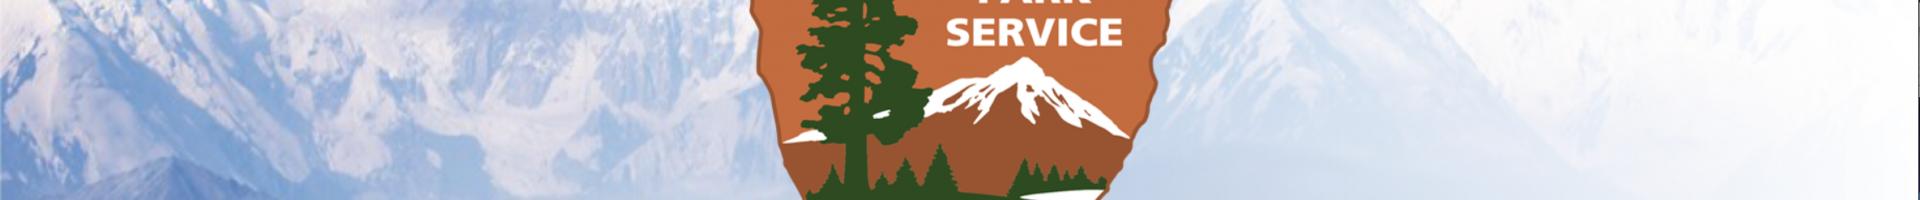 Ecology's Struggle Within The National Parks